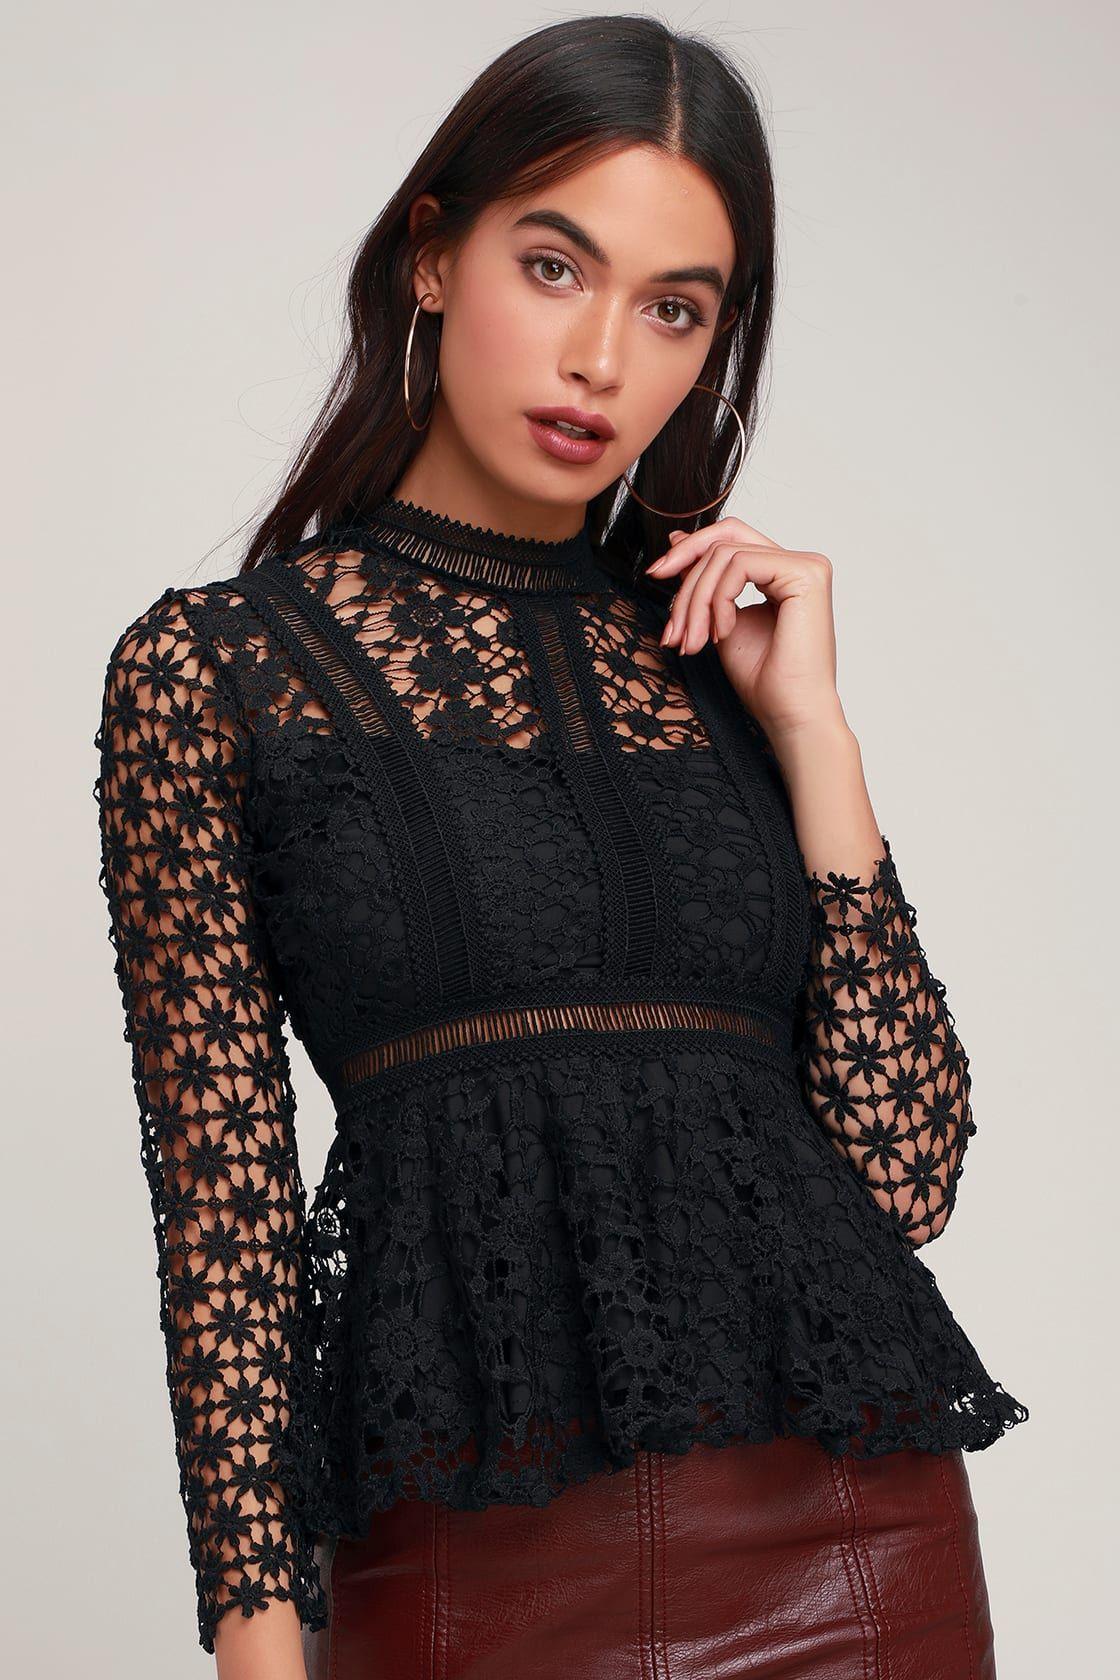 e7c0629c6e Electricity Black Lace Long Sleeve Peplum Top in 2019 | Fashionable ...